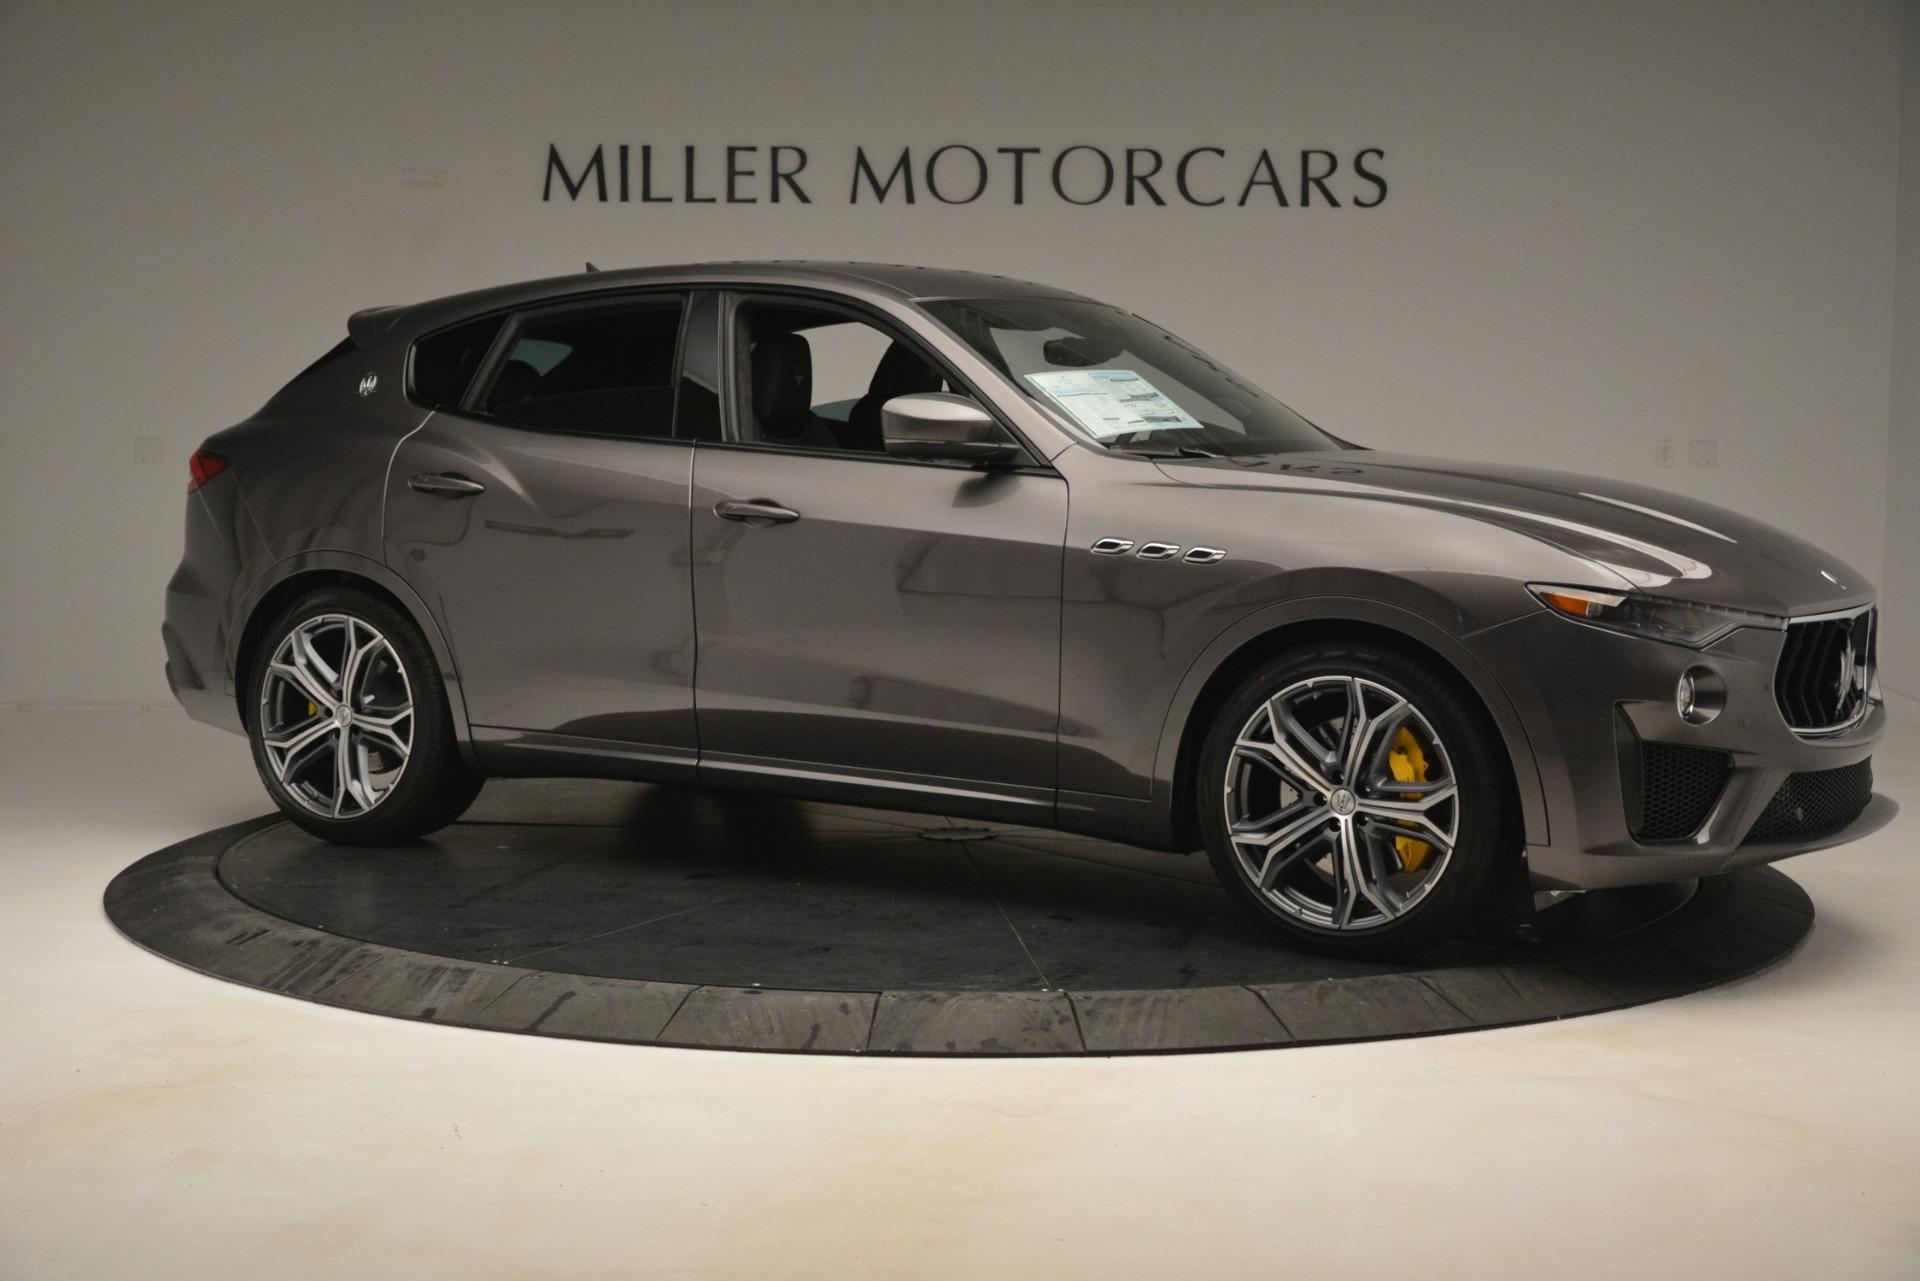 New 2019 Maserati Levante GTS For Sale In Westport, CT 3015_p10